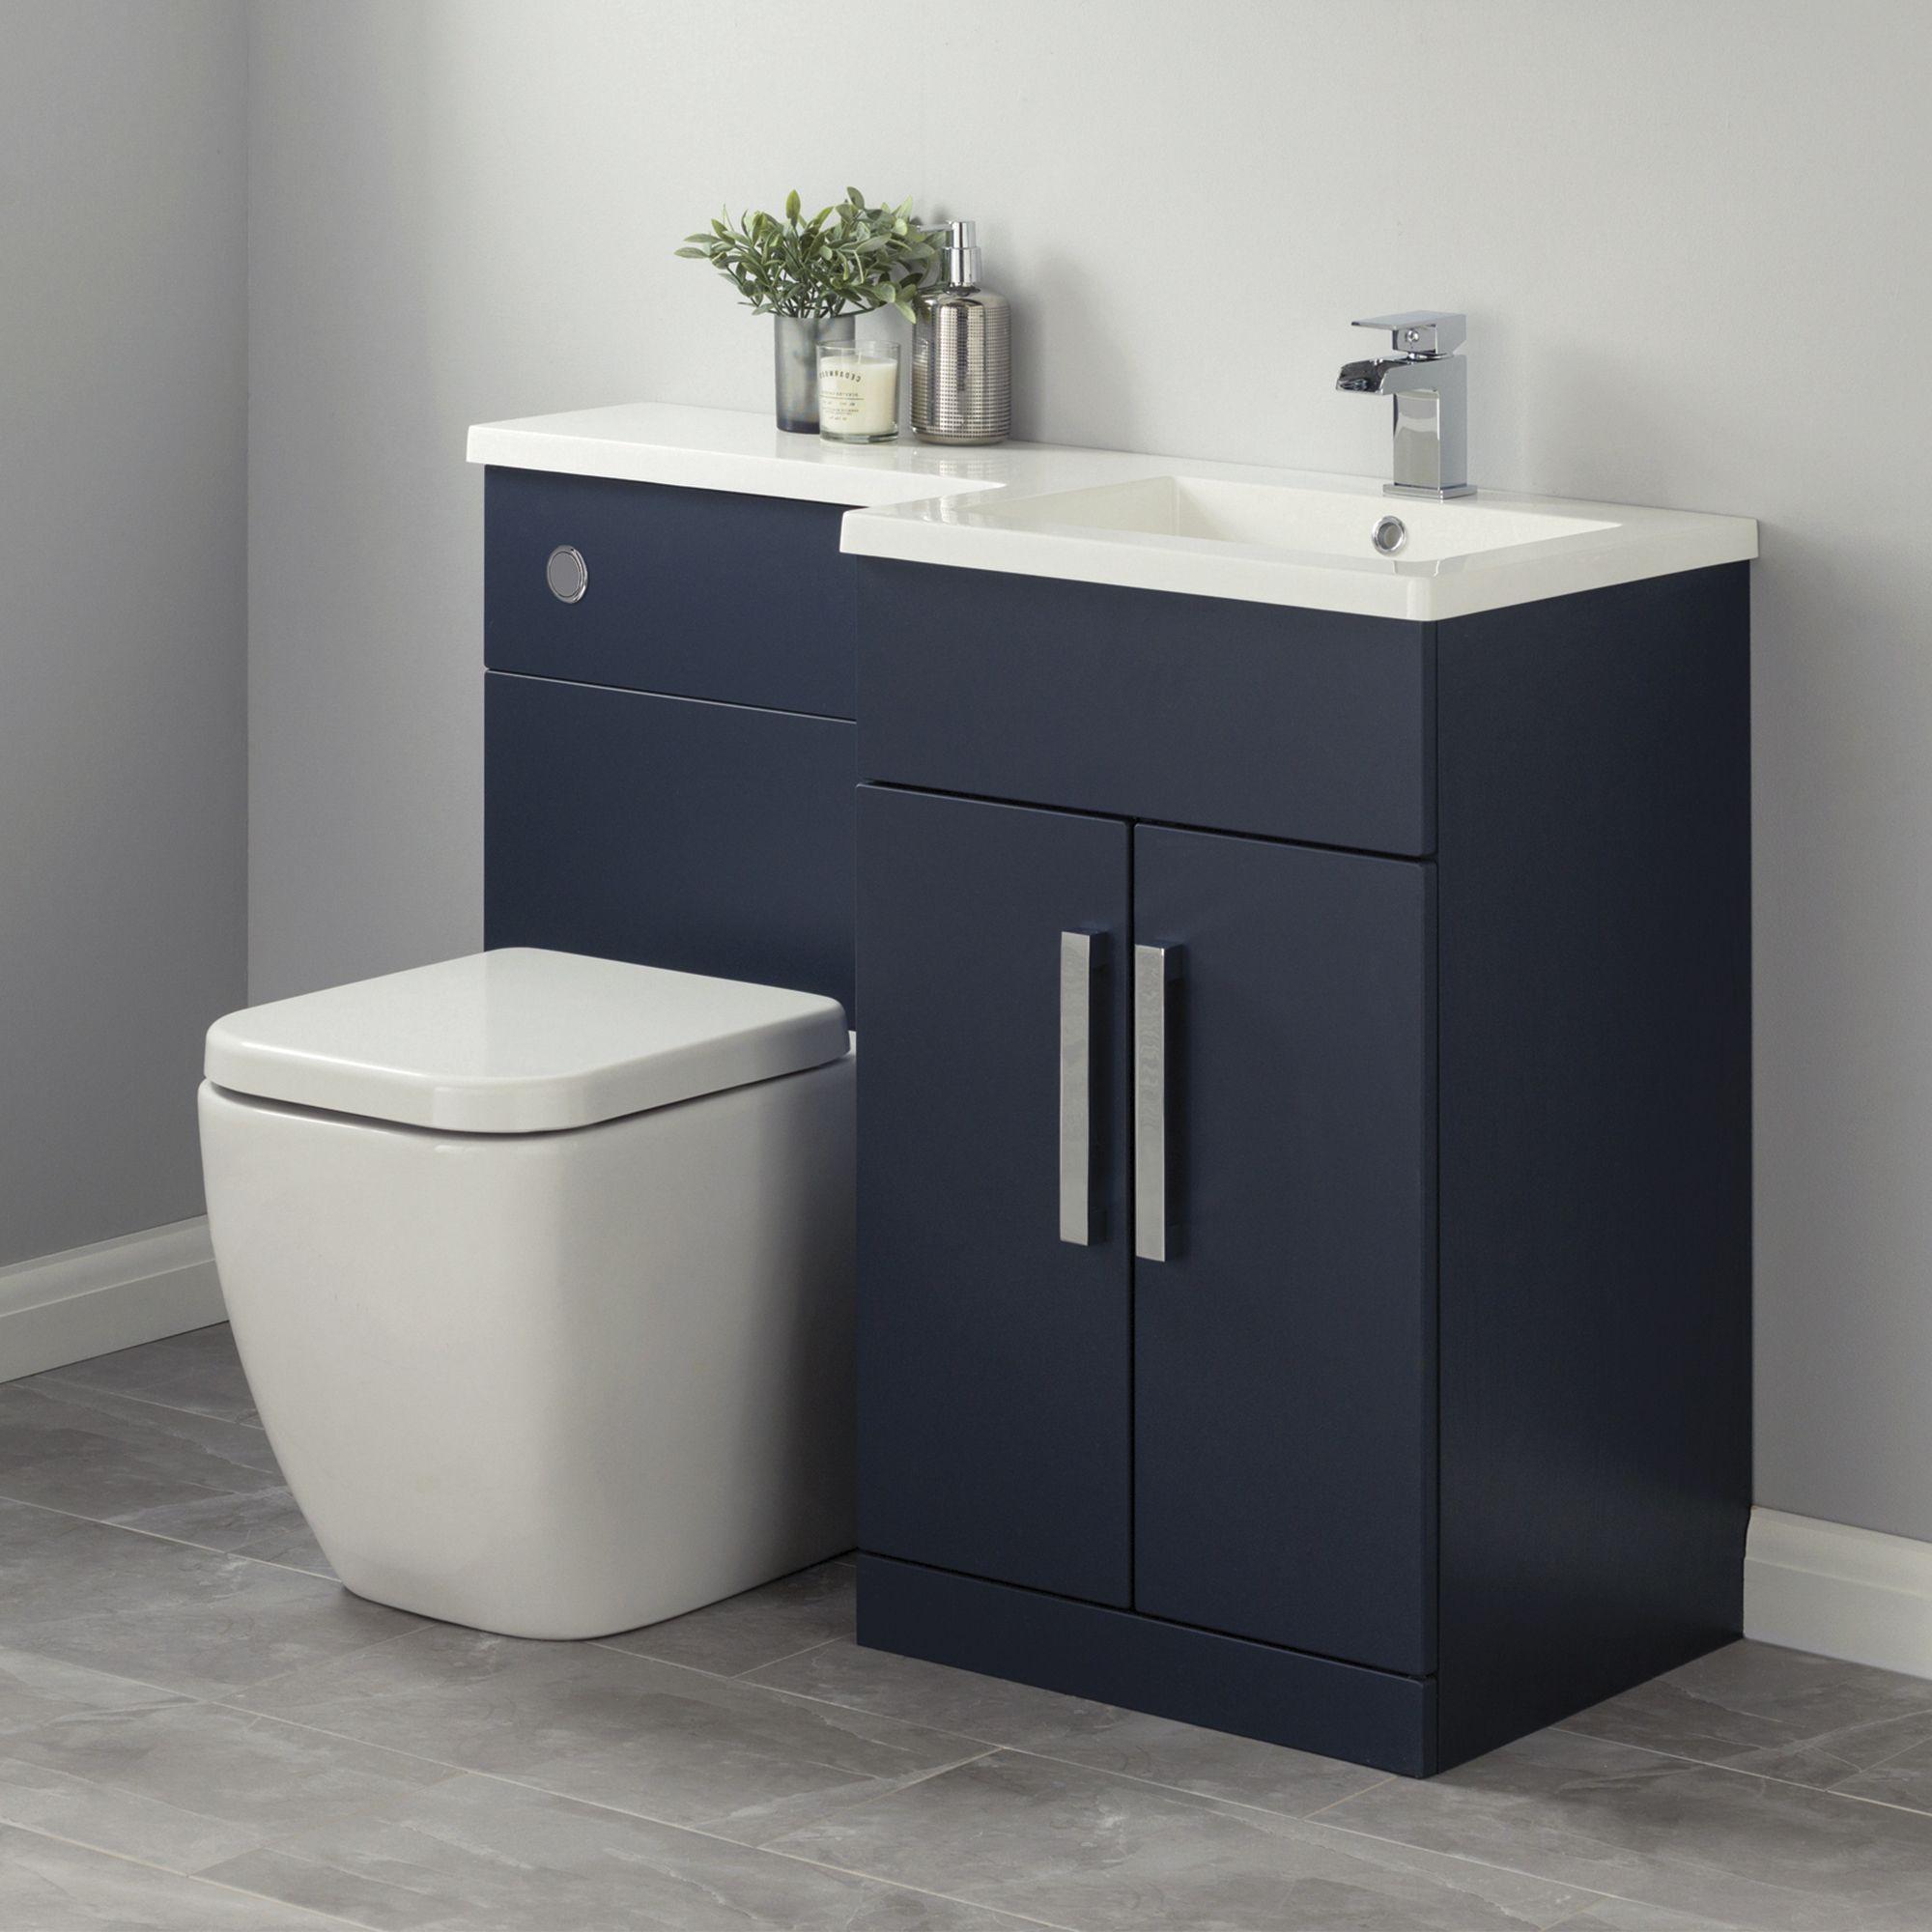 Cooke Lewis Ardesio Matt Indigo White Vanity Wc Unit Basin White Vanity Vanity Bathroom Vanity Units